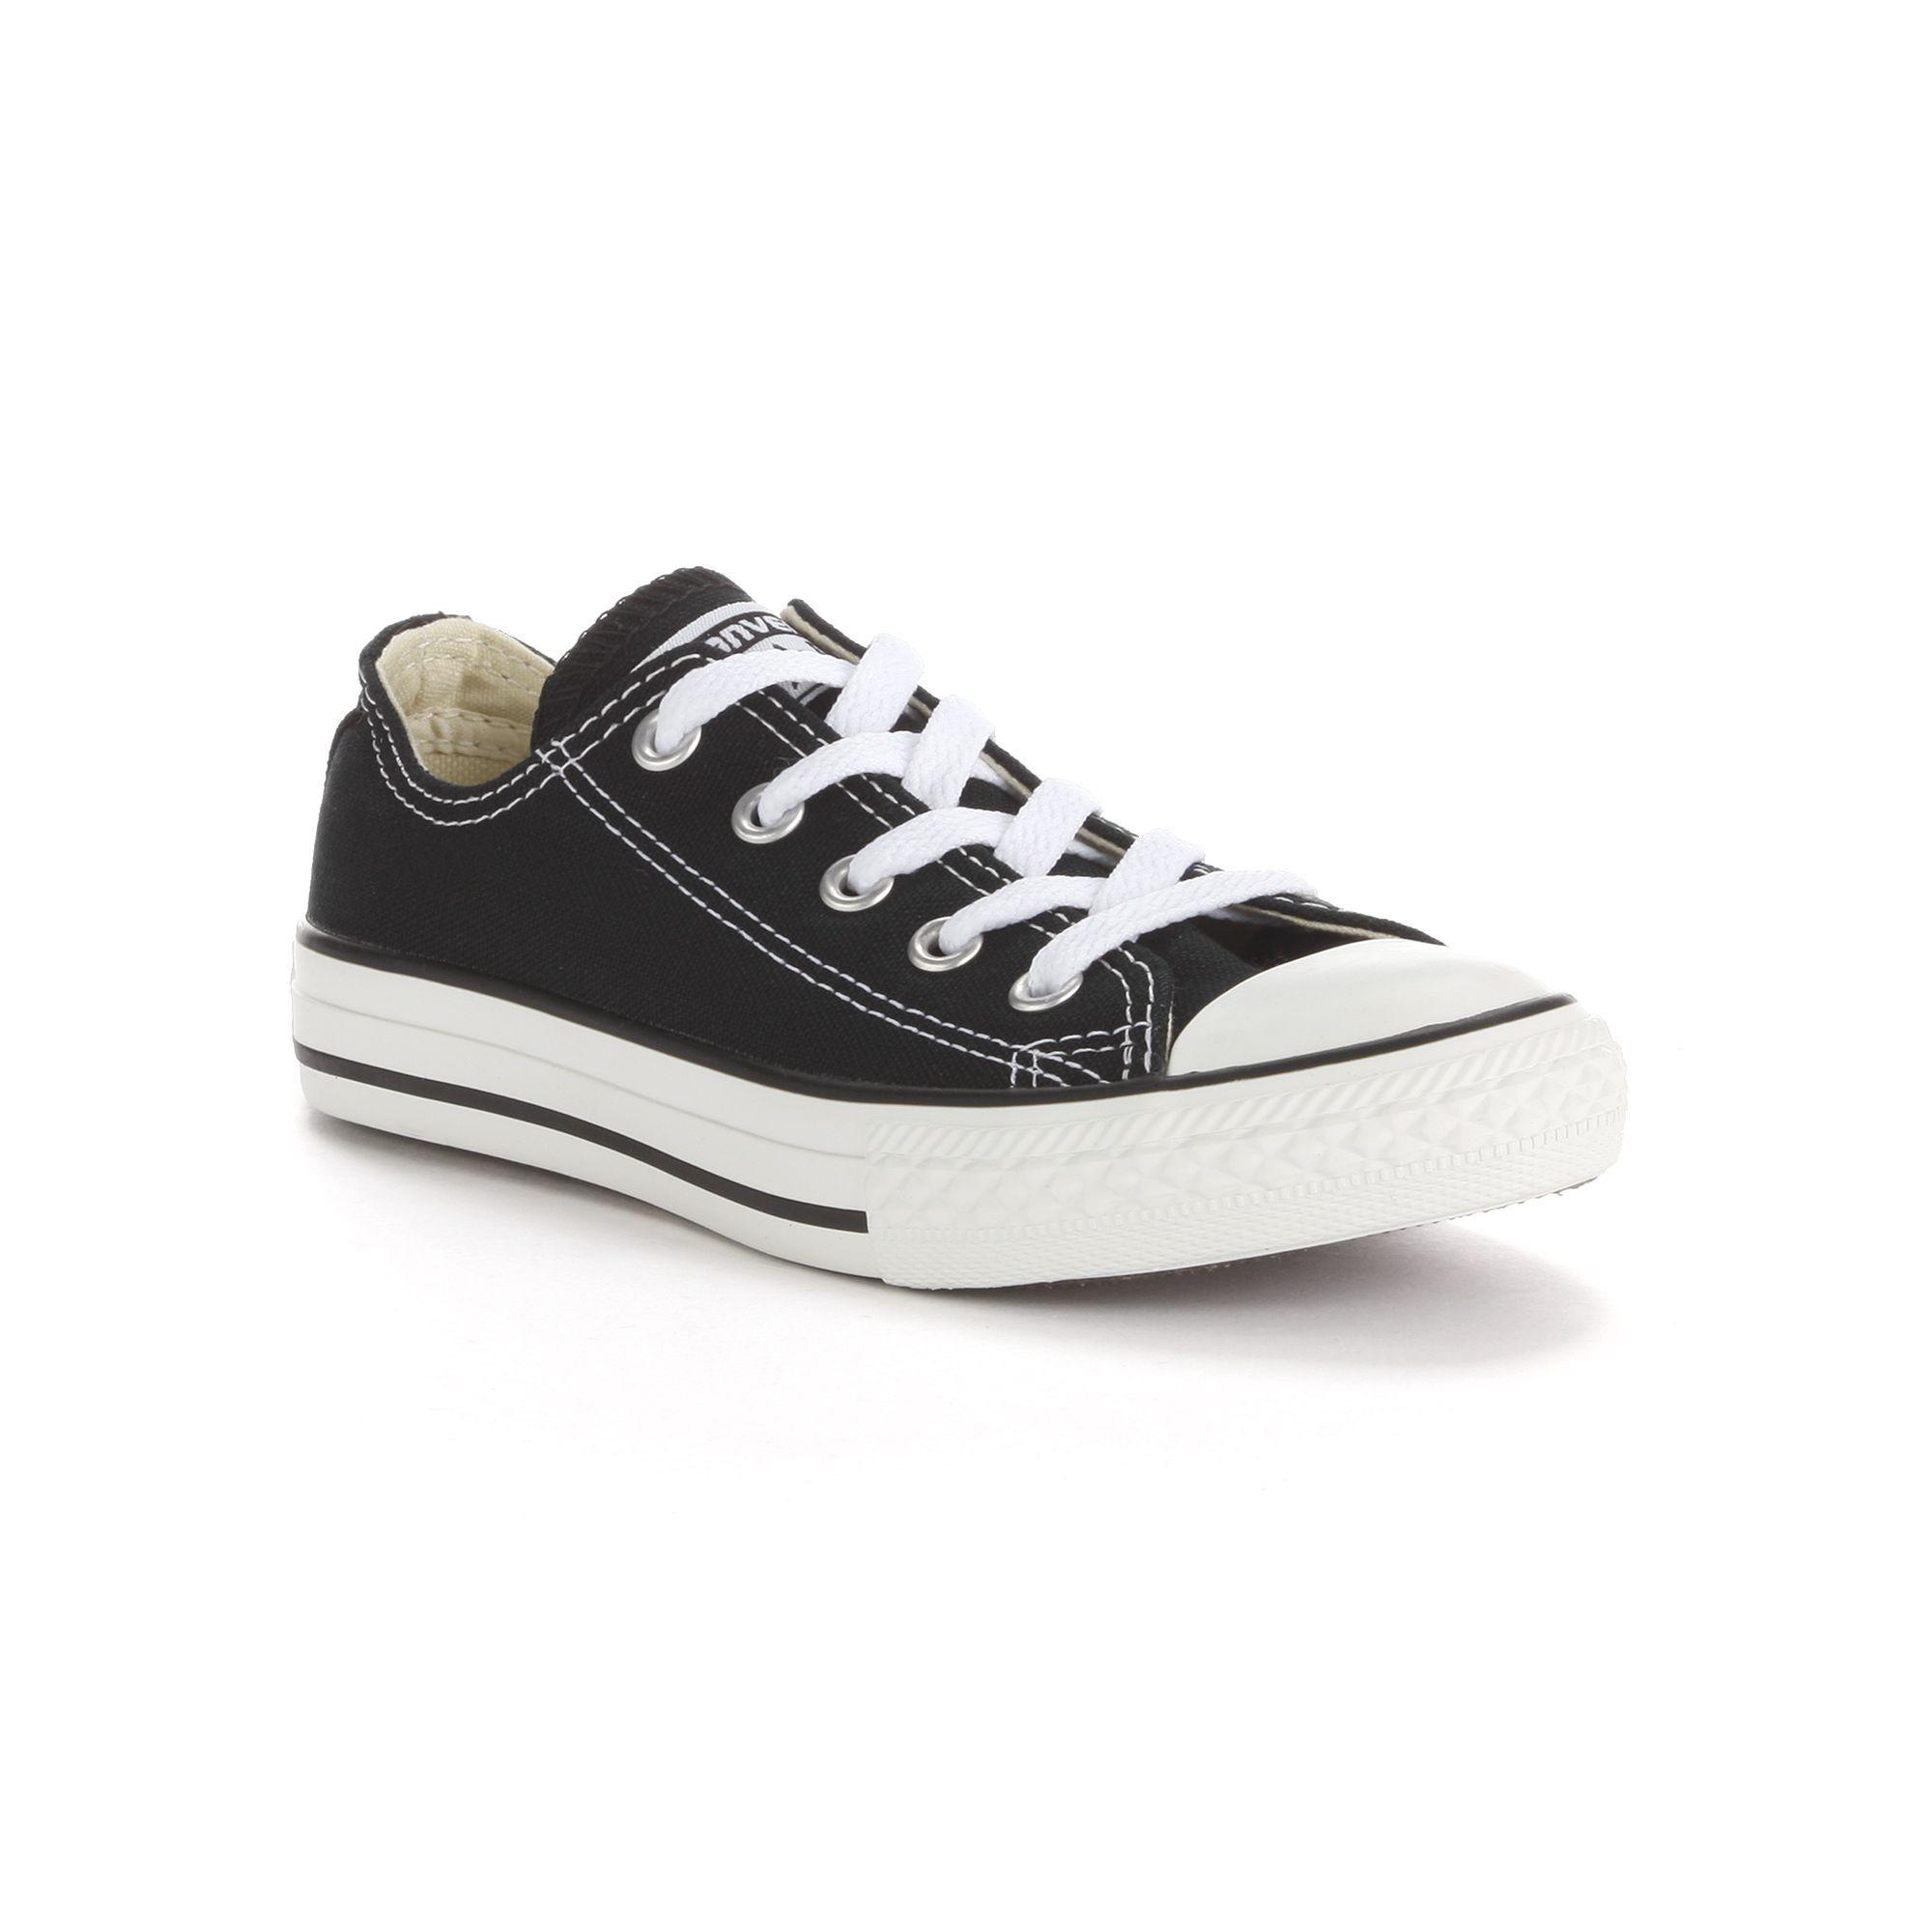 fb73f4aa3014 Kid s Converse Chuck Taylor All Star Sneakers